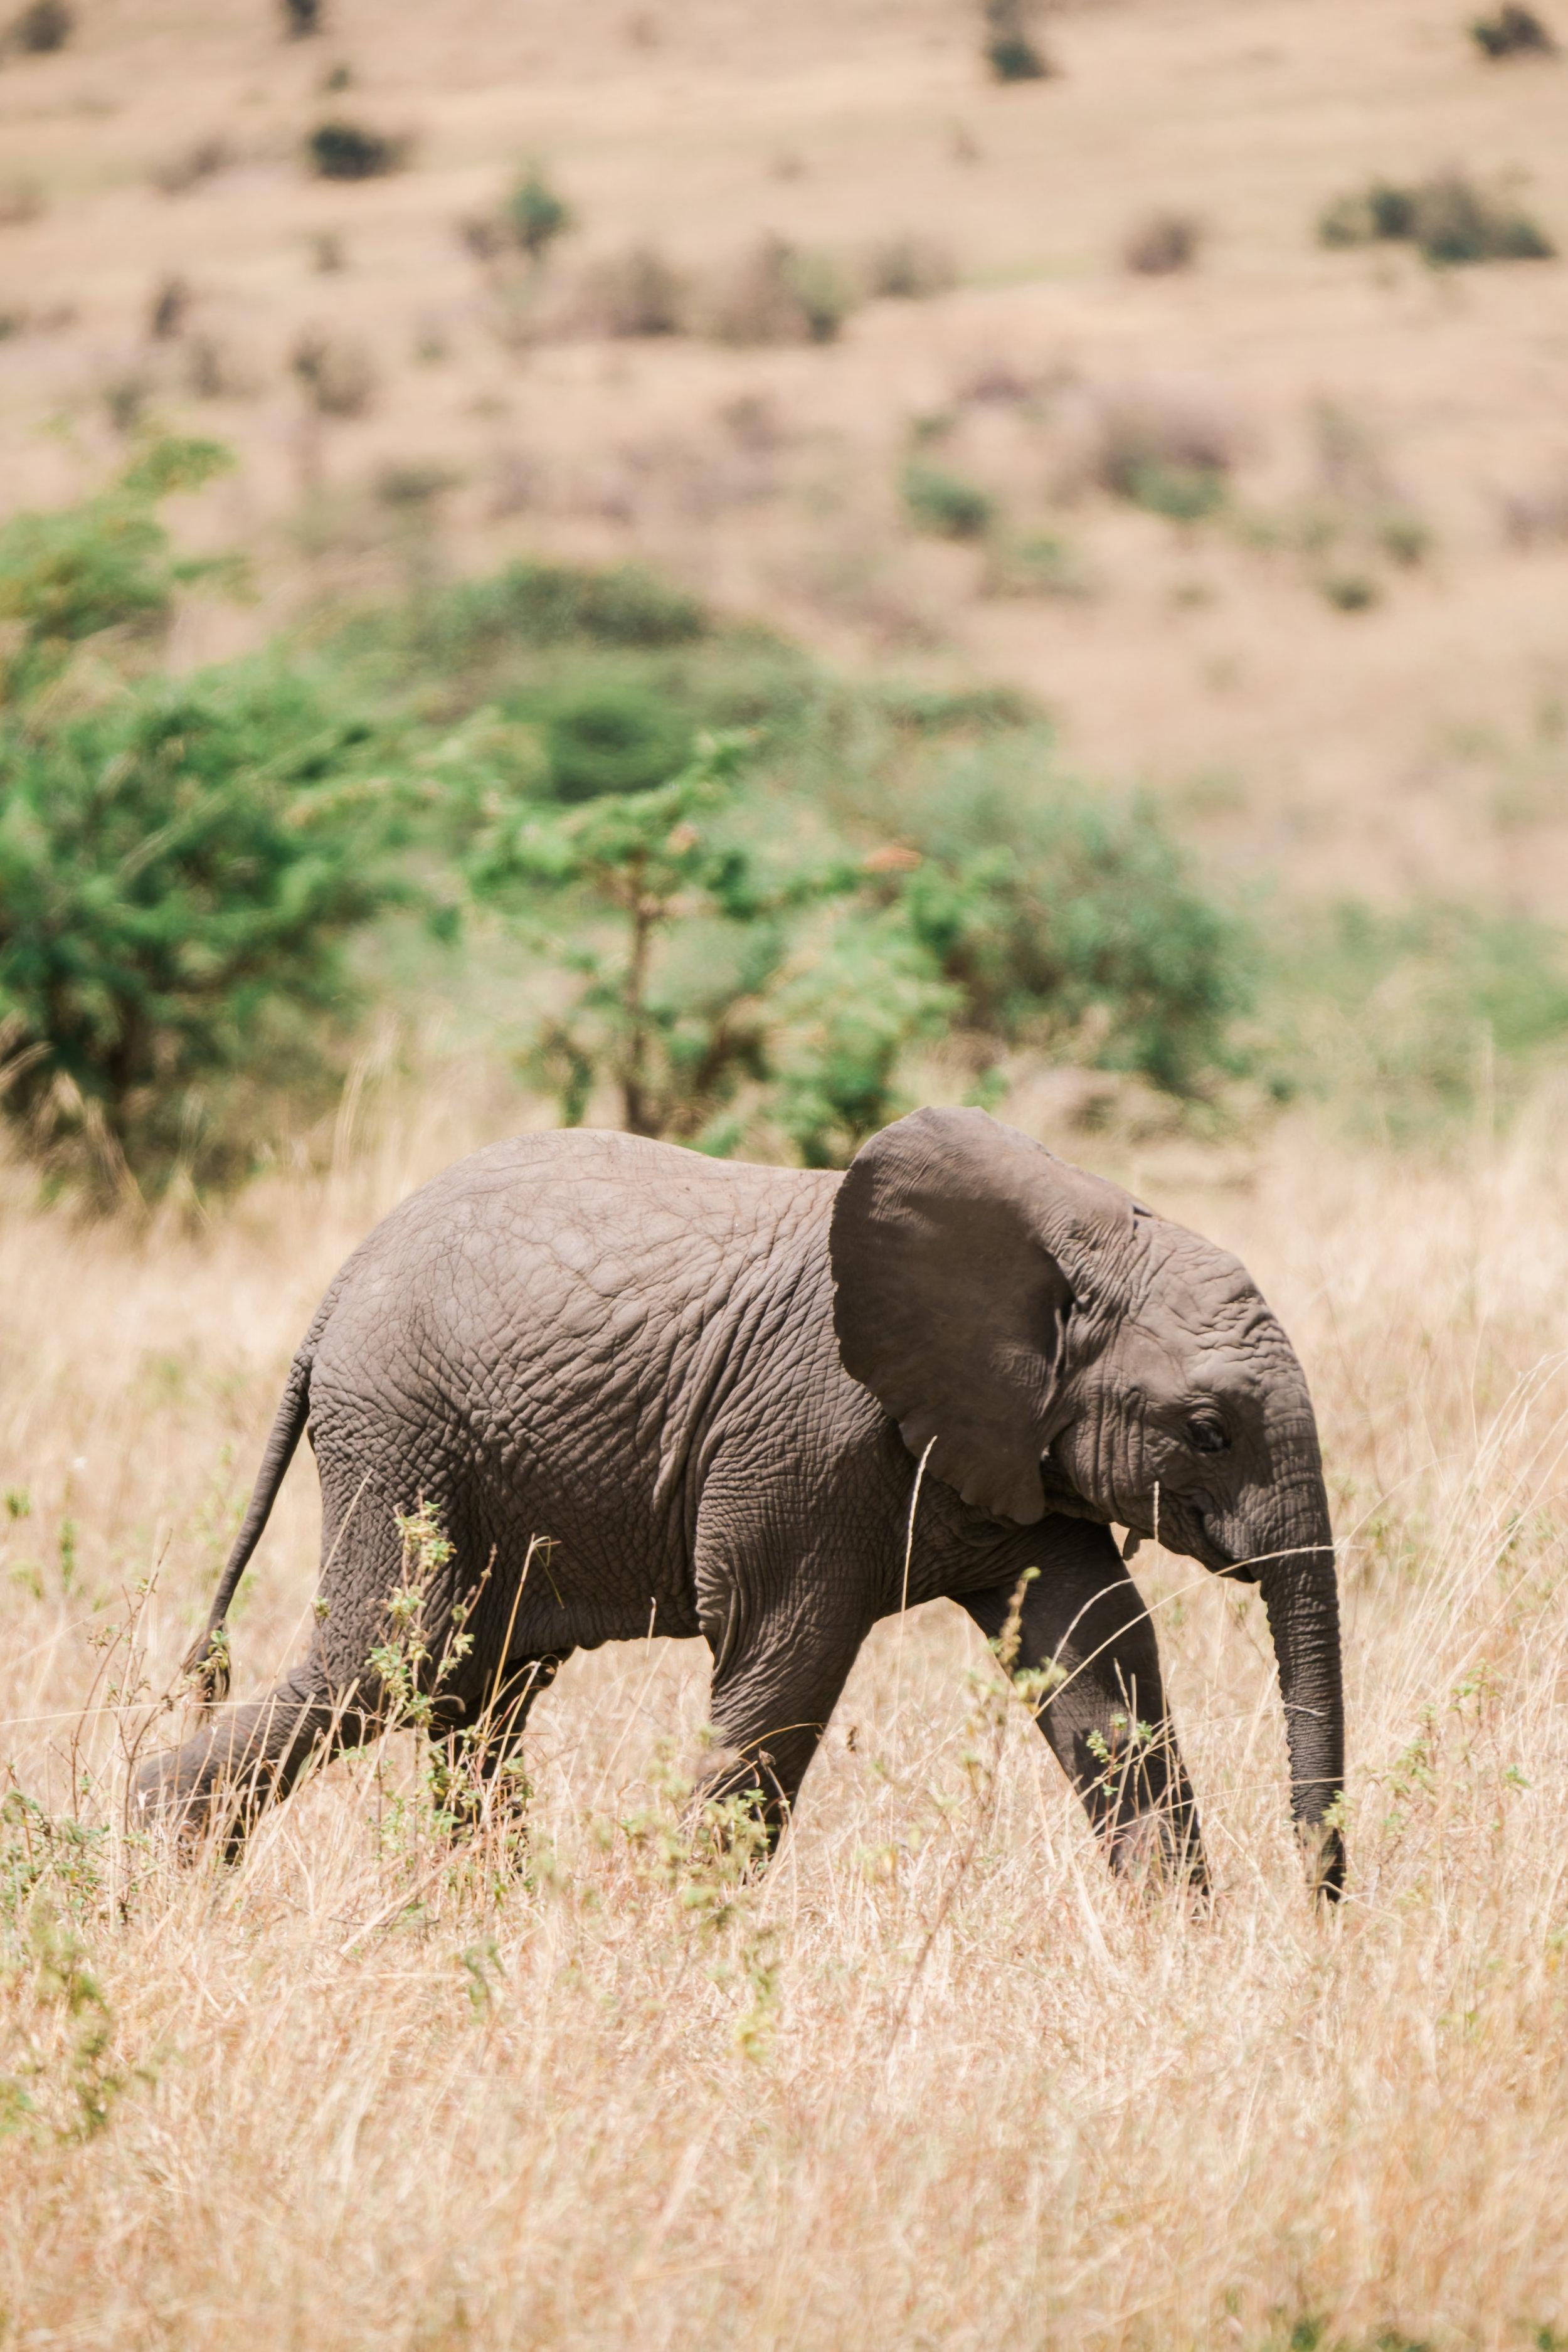 Baby Elephant - Kenya Safari Ph. Valorie Darling